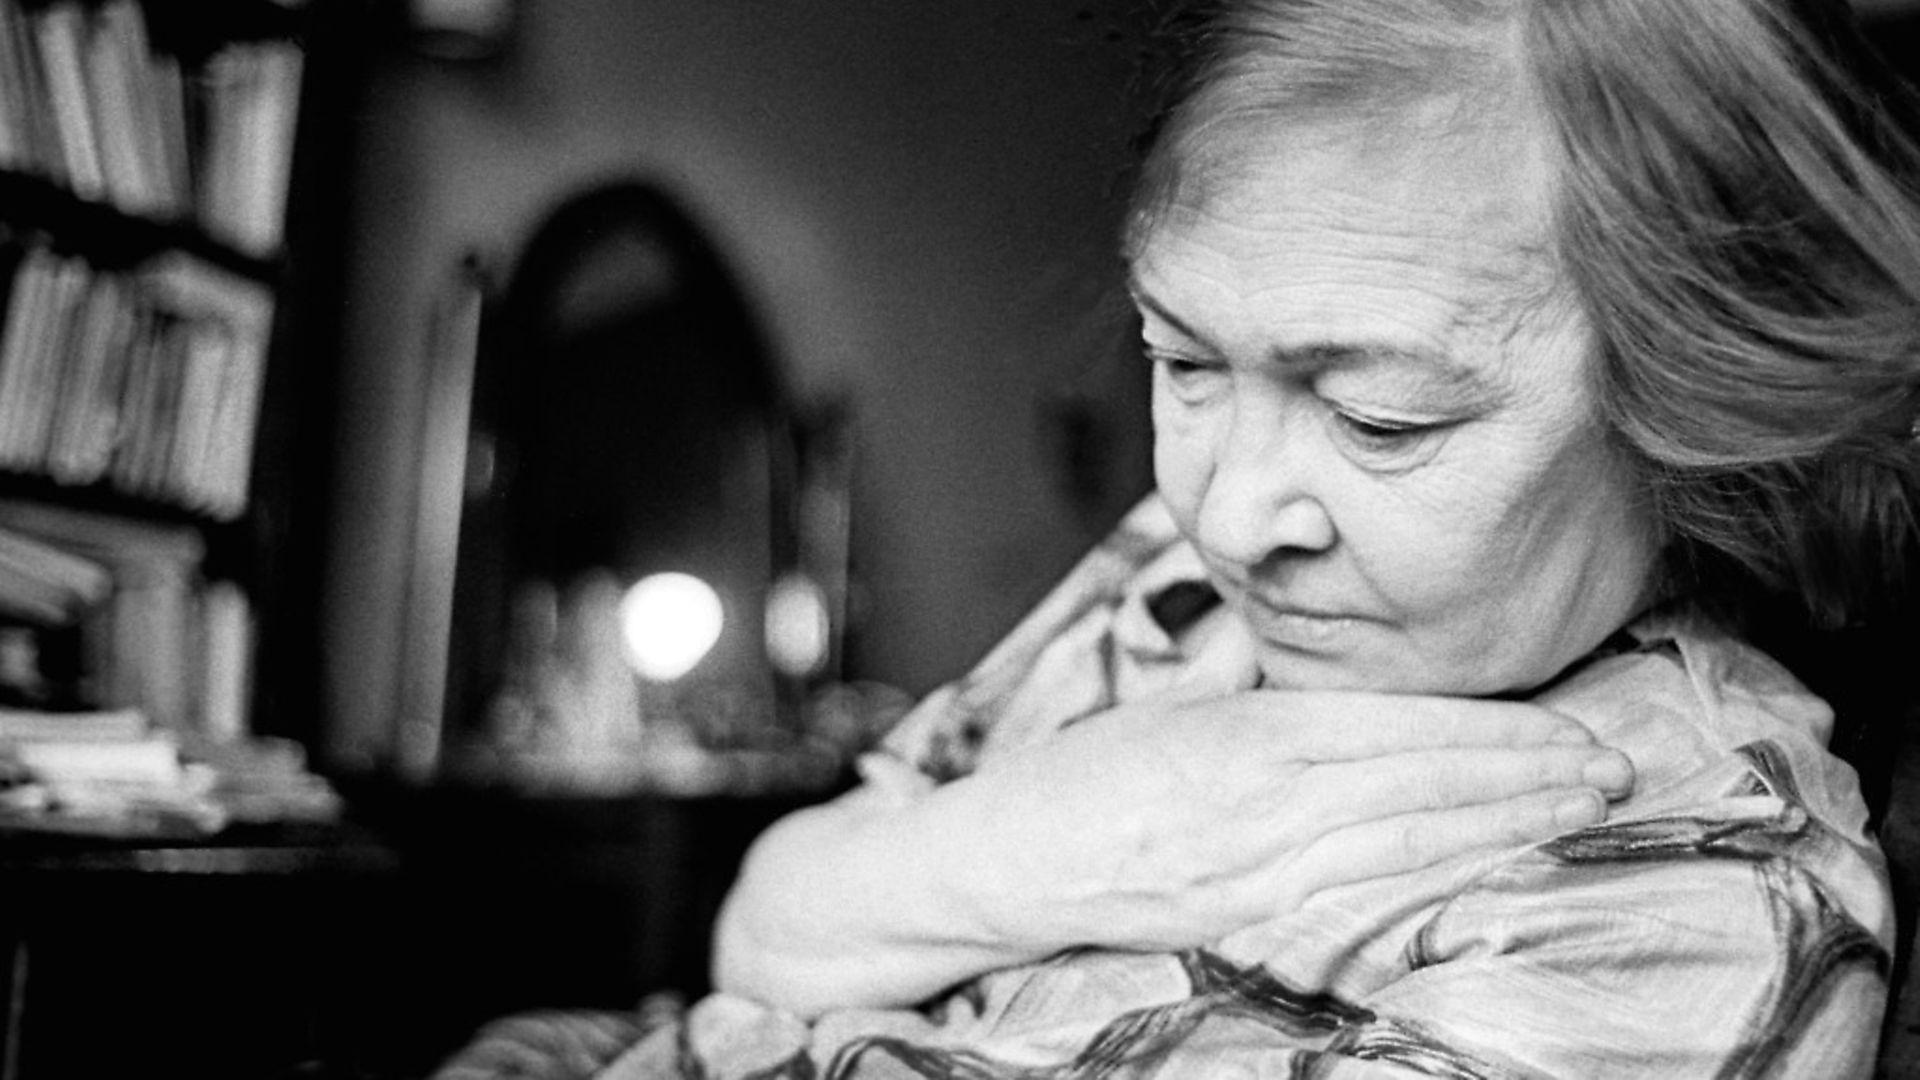 Soviet poet Olga Fyodorovna Bergholz (1910 - 1975) in Leningrad, 1973. Photo: Leonid Lazarev/Getty Images - Credit: Getty Images